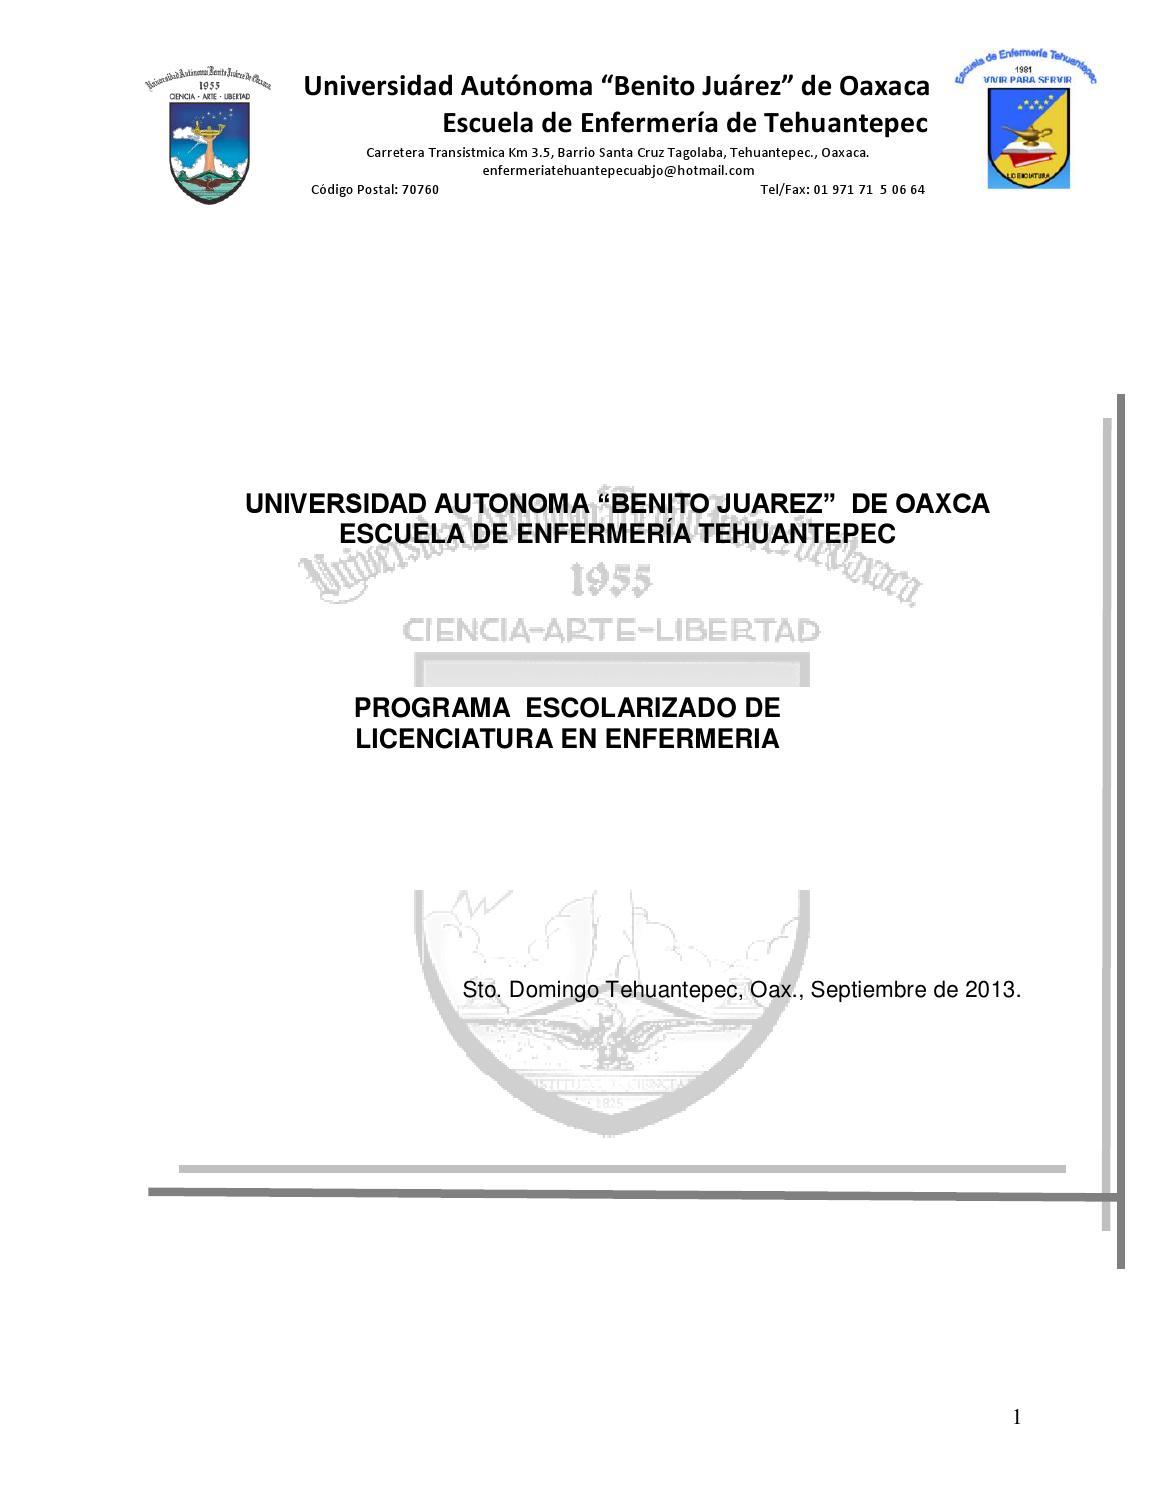 Programa eeto by Sergio Amaro - issuu